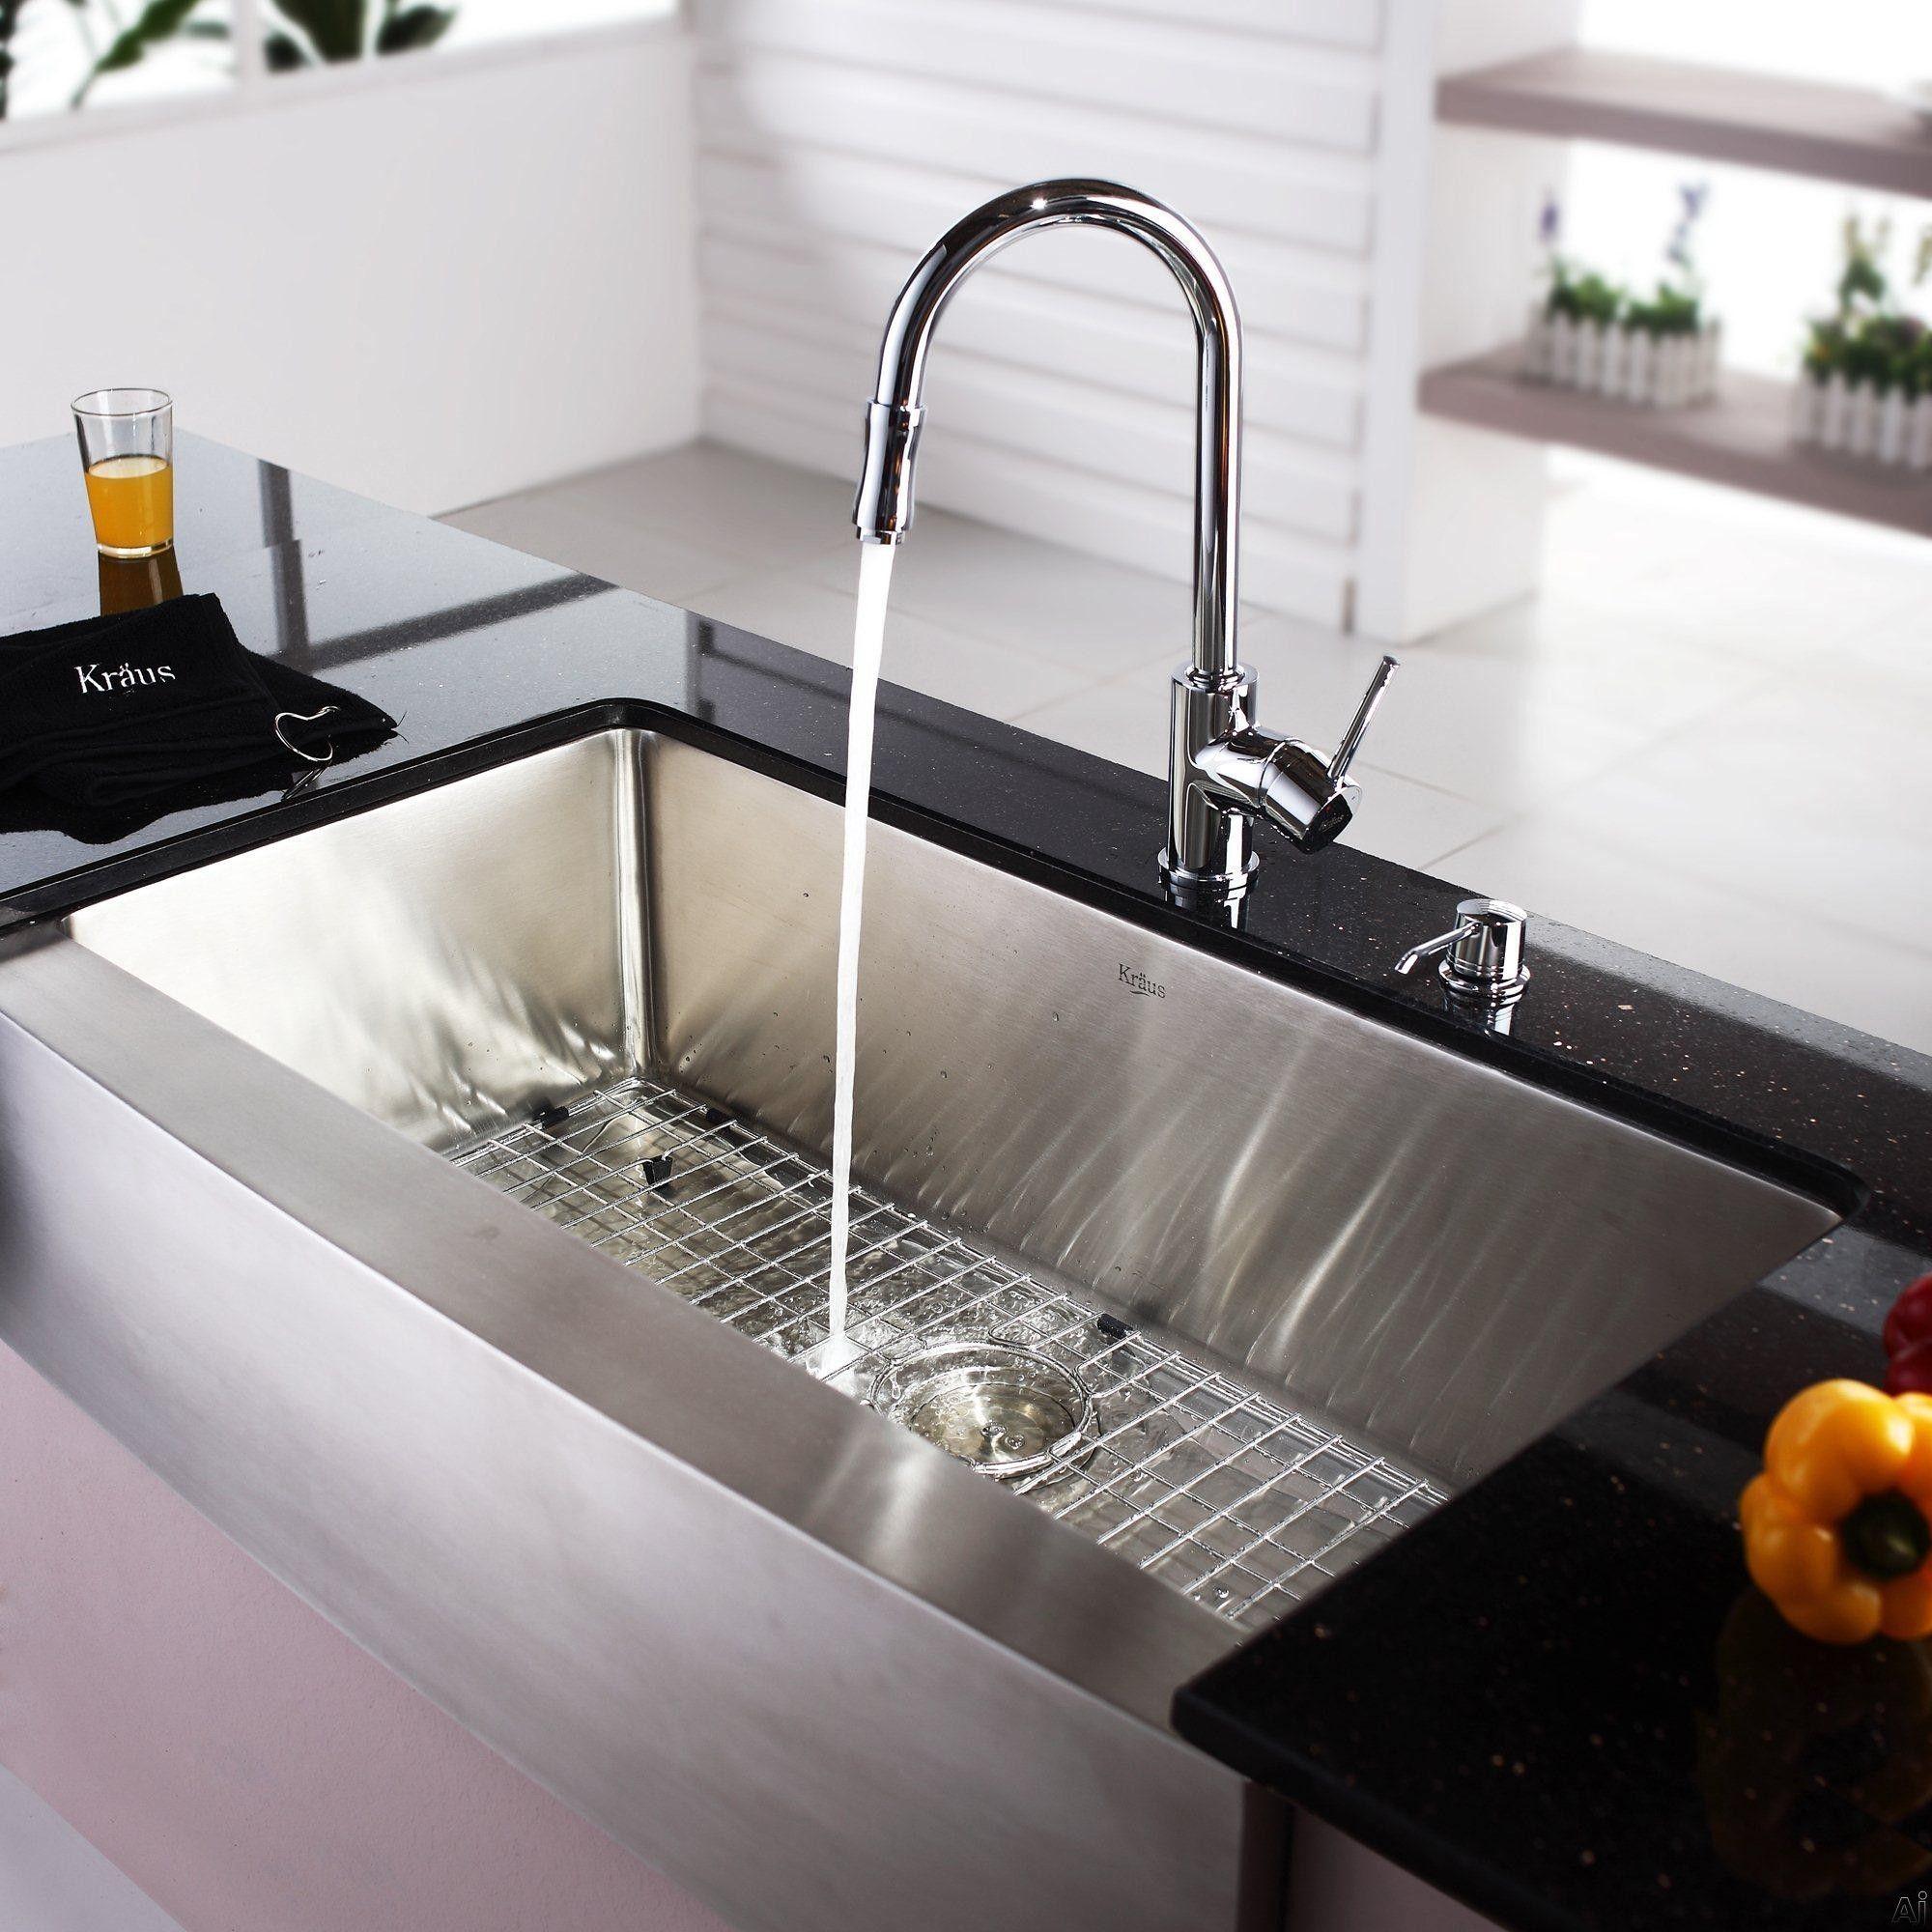 kraus kitchen combo series khf20036kpf1622ksd30ch 36 inch farmhouse single bowl stainless steel sink with pull  kraus kitchen combo series khf20036kpf1622ksd30ch 36 inch      rh   pinterest com